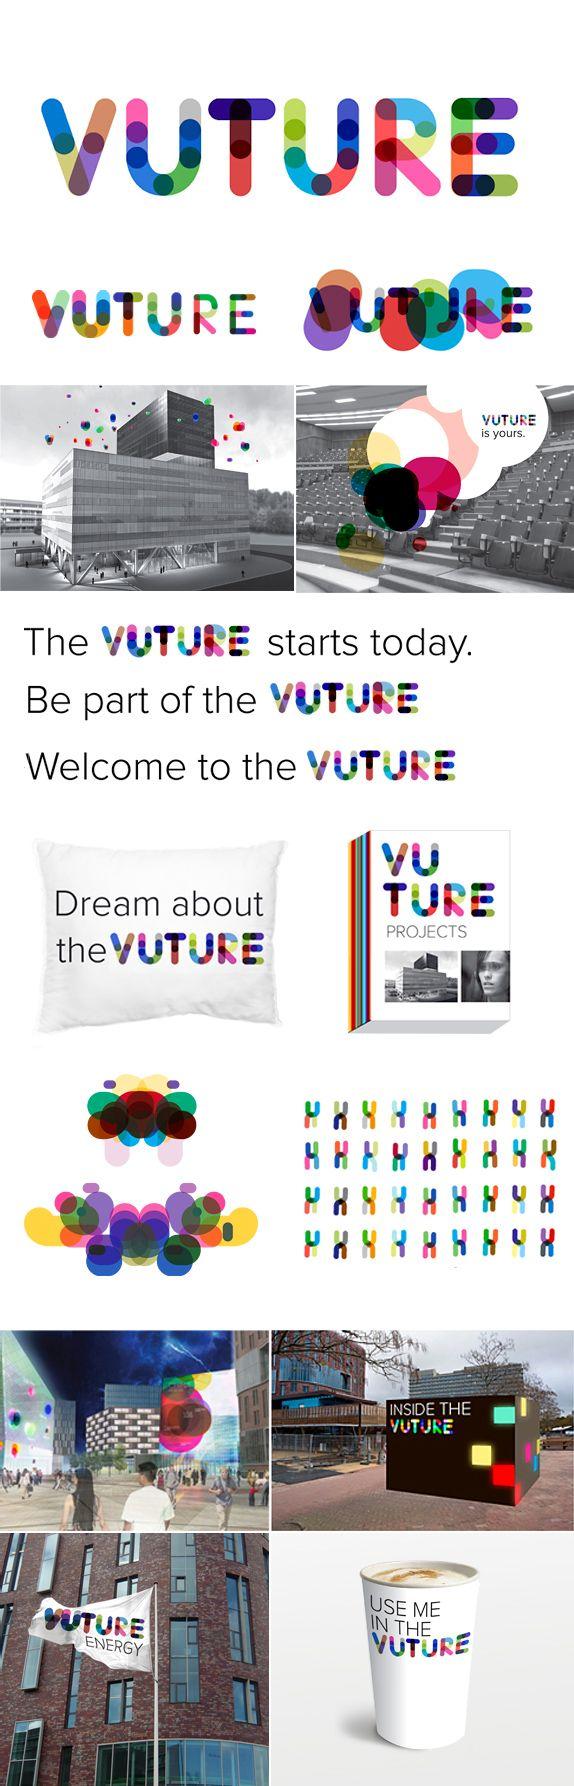 Corporate Design, ID, Logo, Poster, Outdoor Media, Wayfinding, VUTURE University…